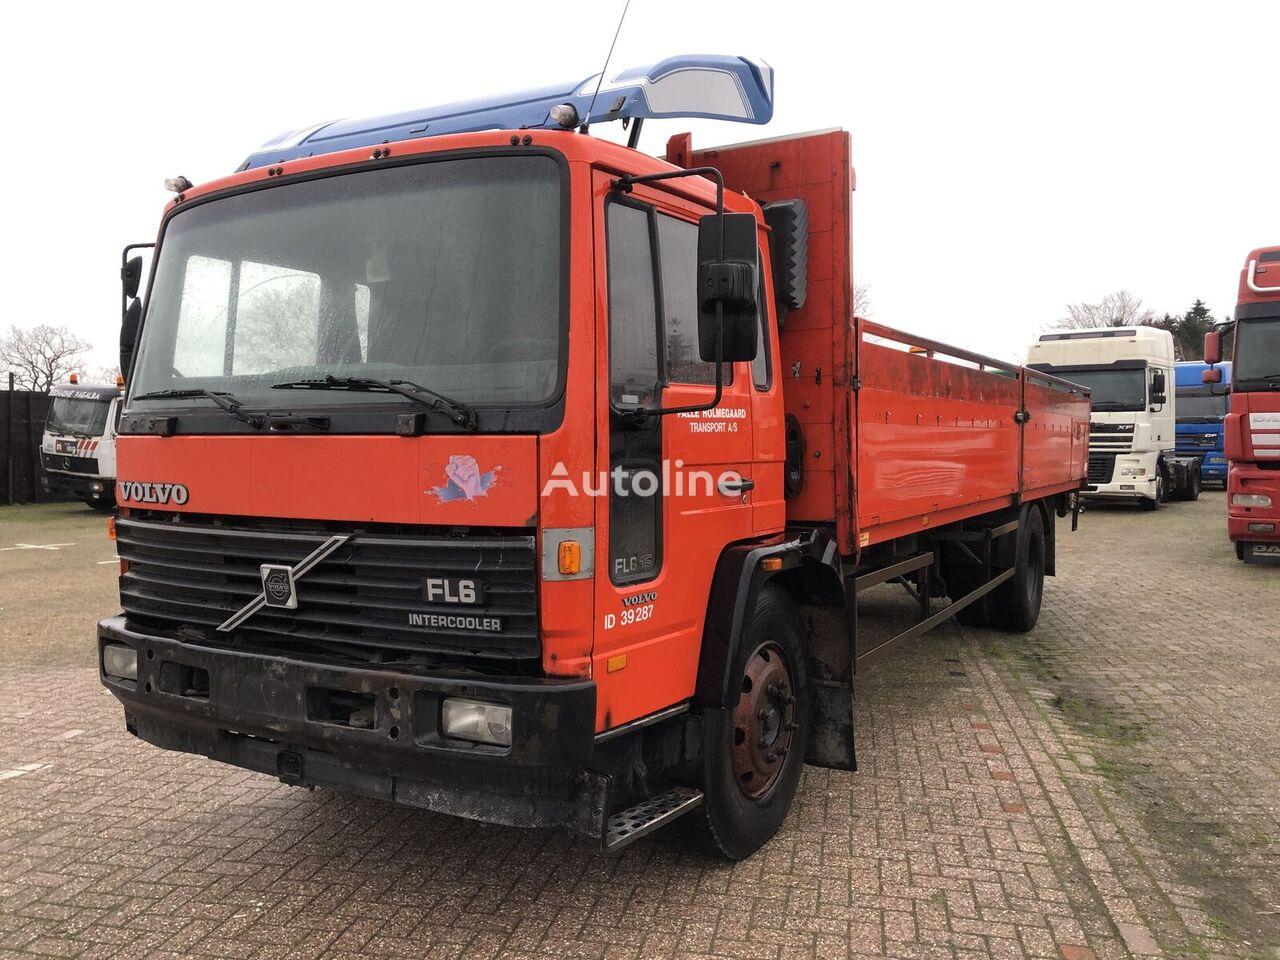 VOLVO FL6 15 flatbed truck